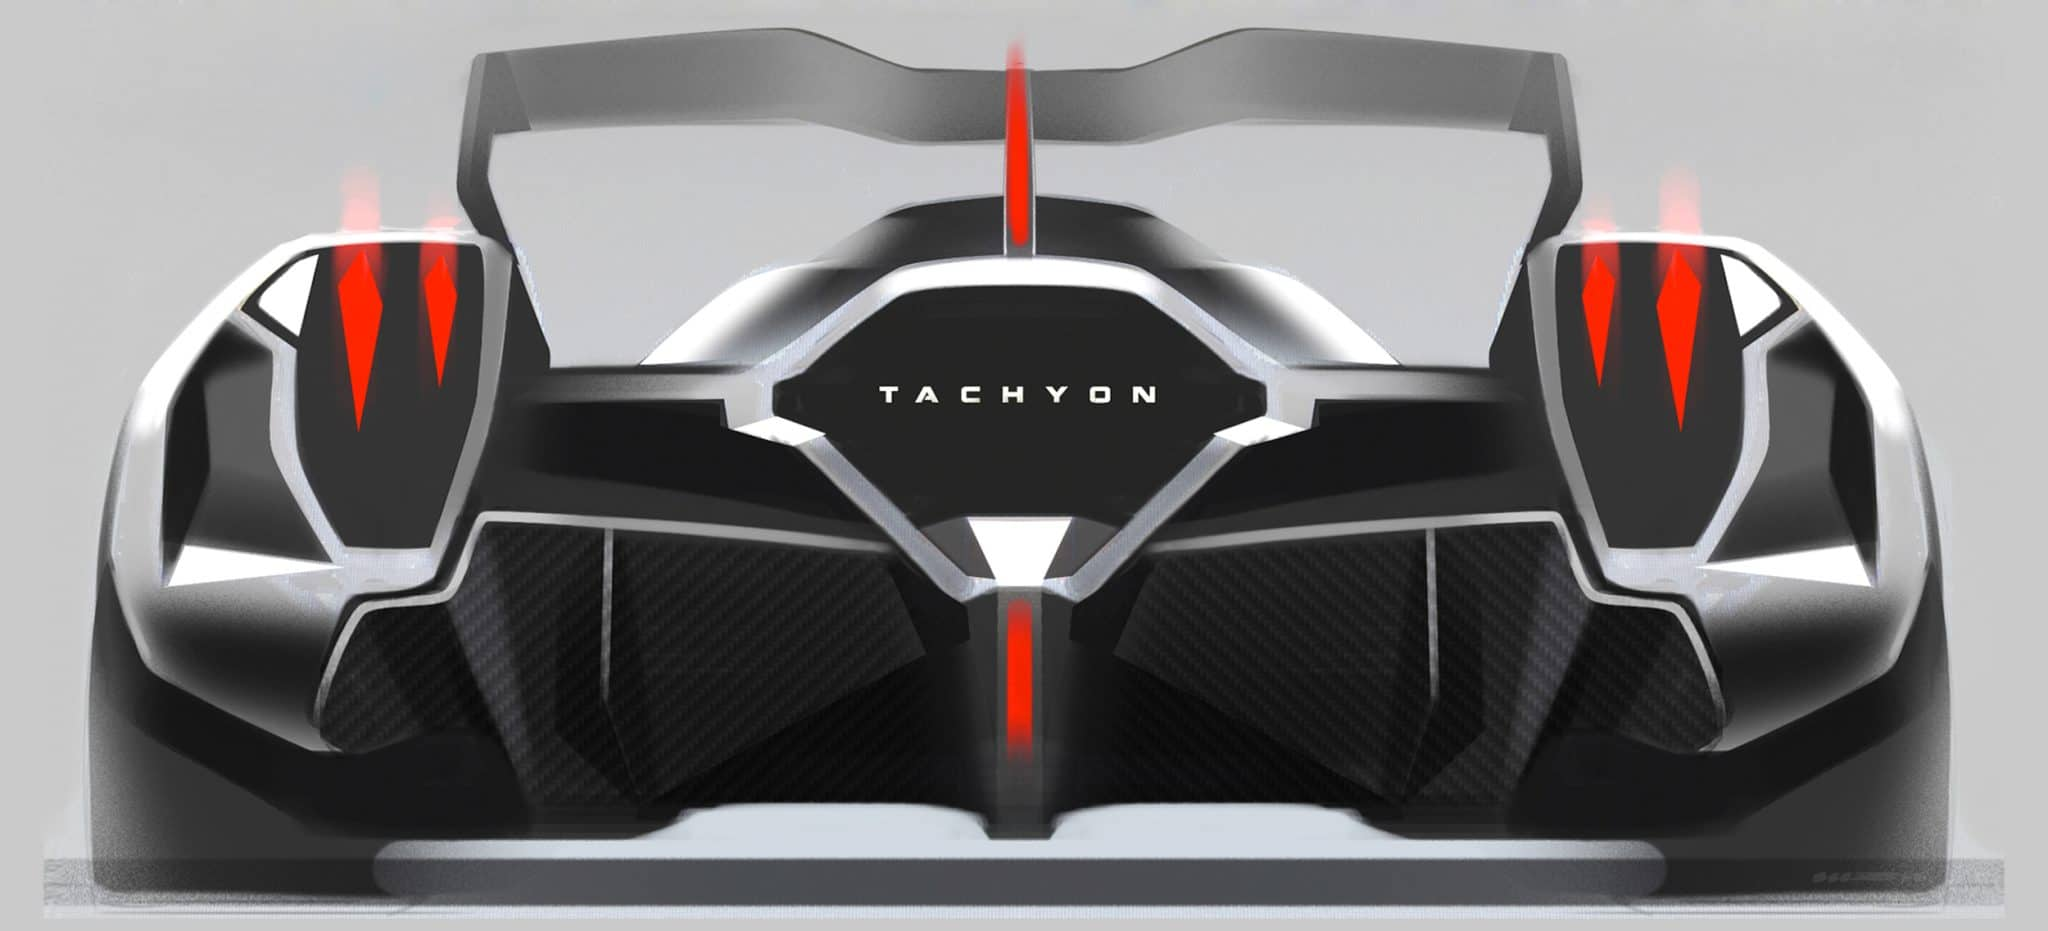 Tachyon Speed de RAESR